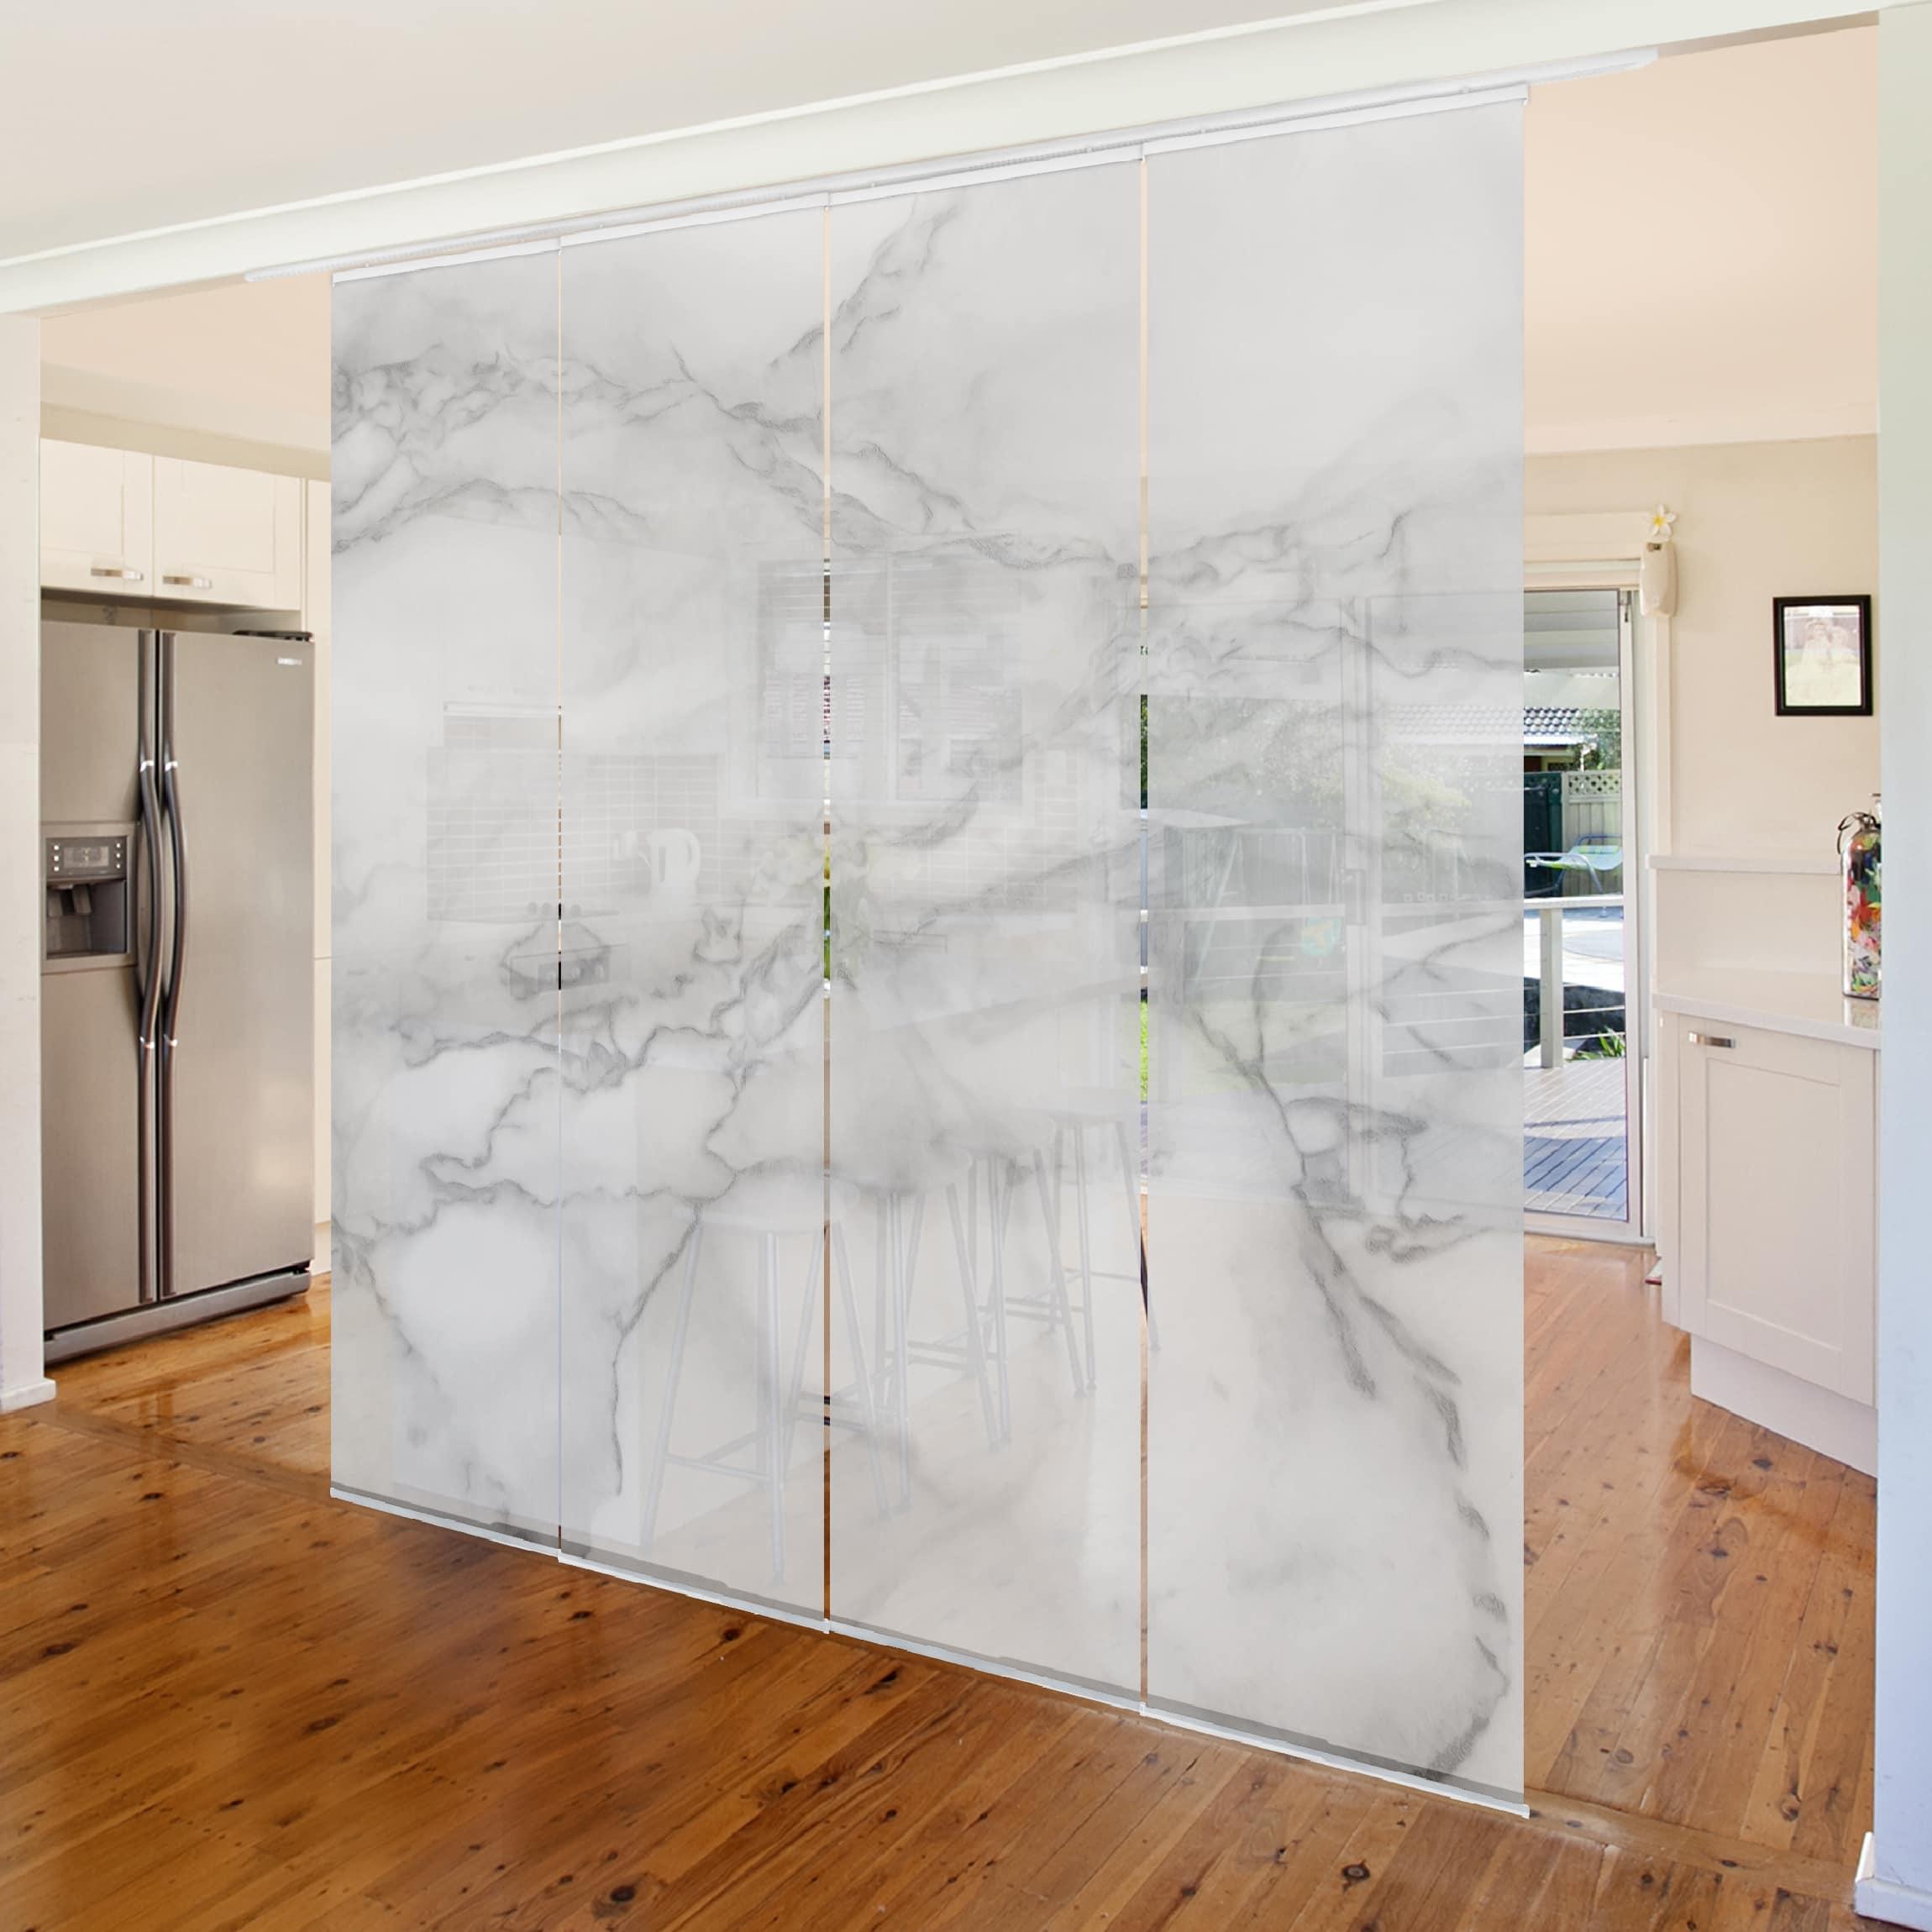 schiebegardinen set marmoroptik schwarz wei 4. Black Bedroom Furniture Sets. Home Design Ideas